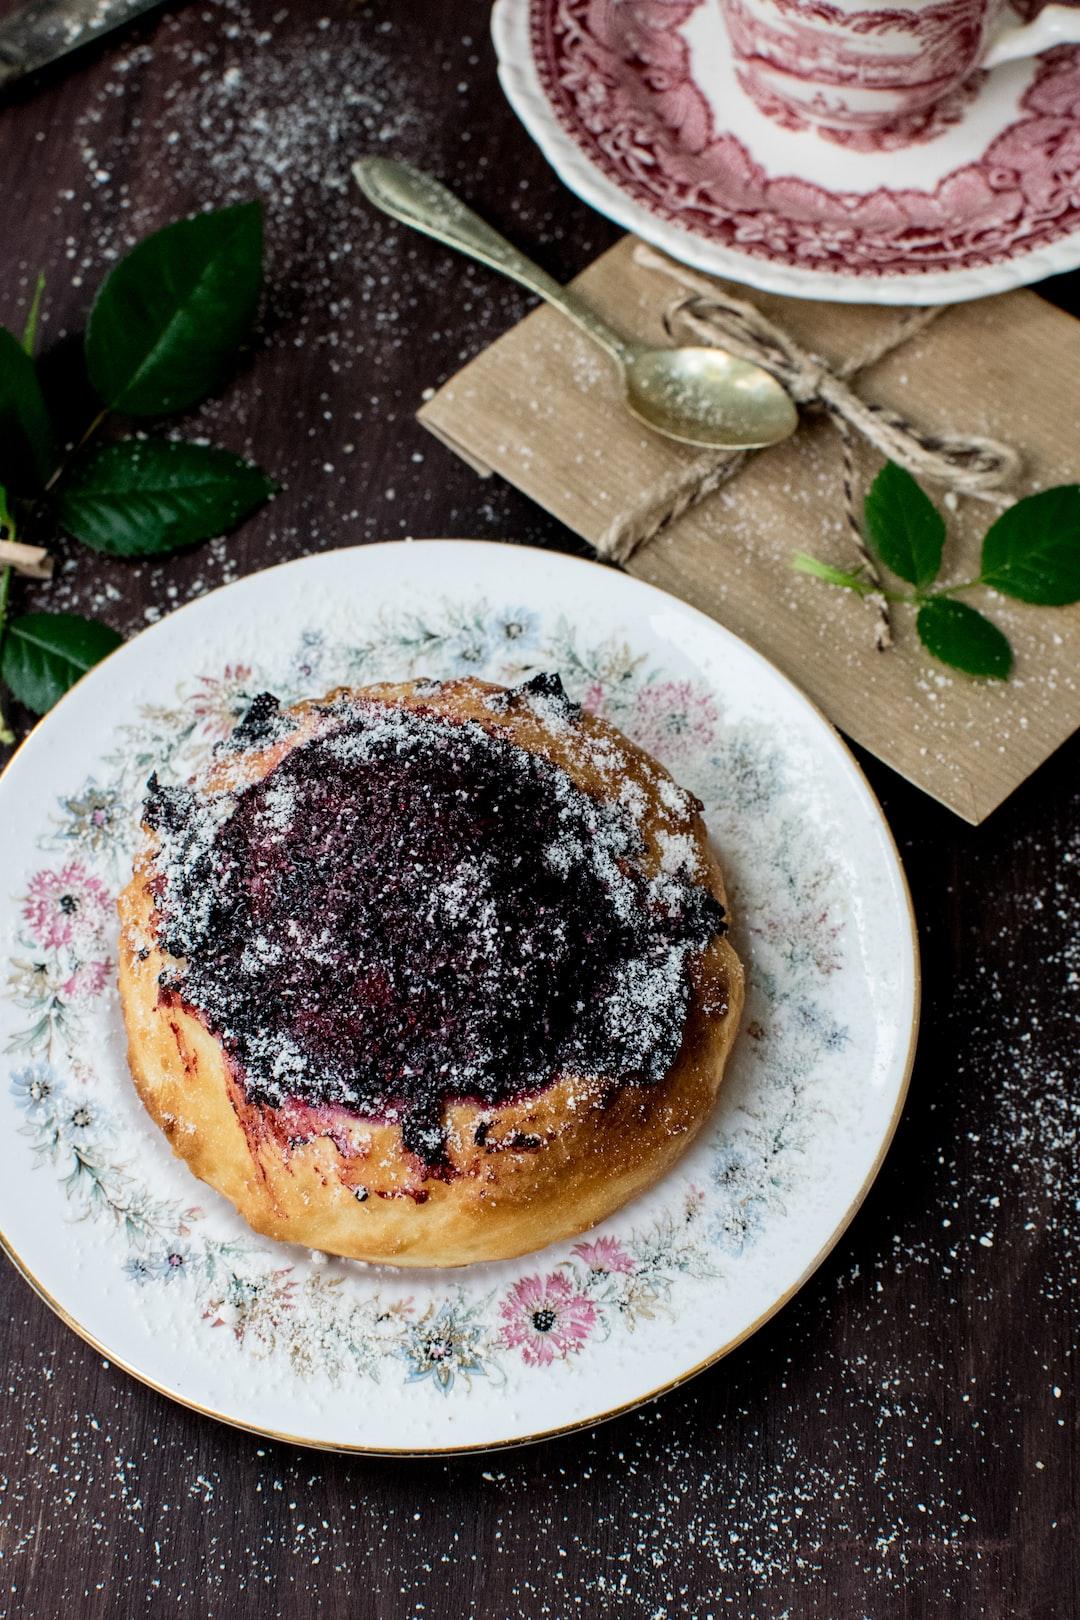 yeast bun with honey and blackcurrant jam